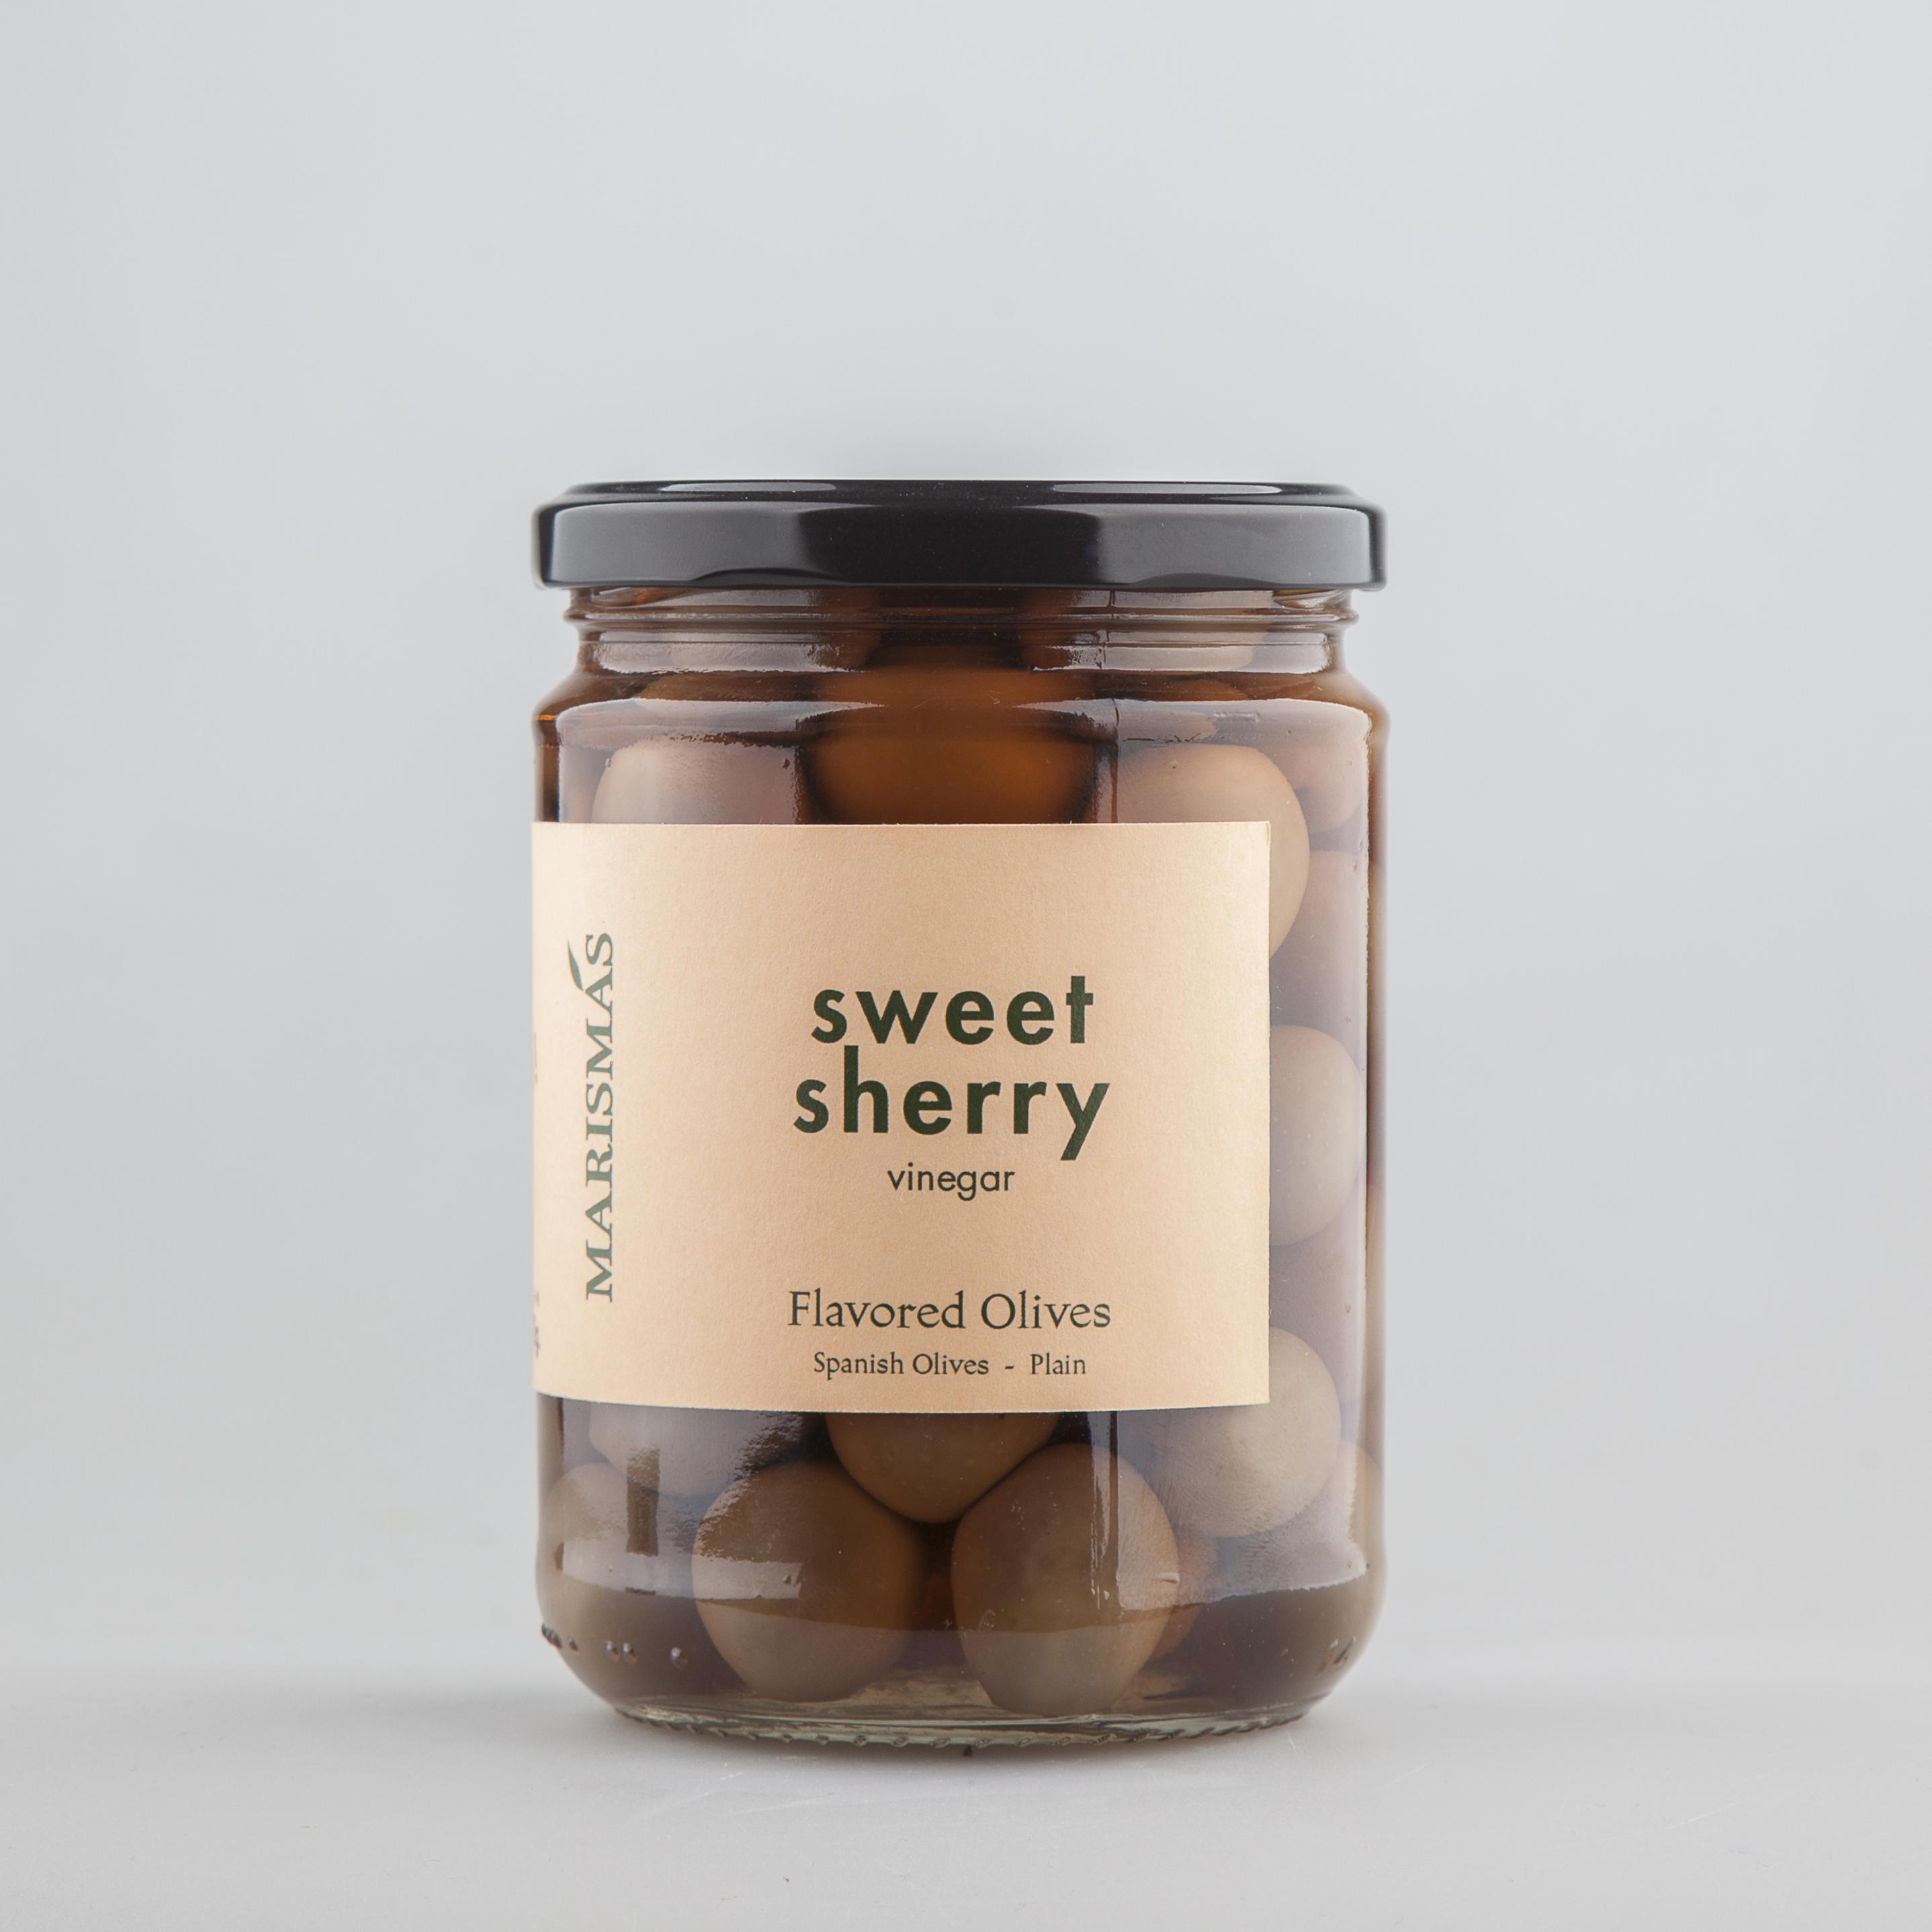 Sweet Serry